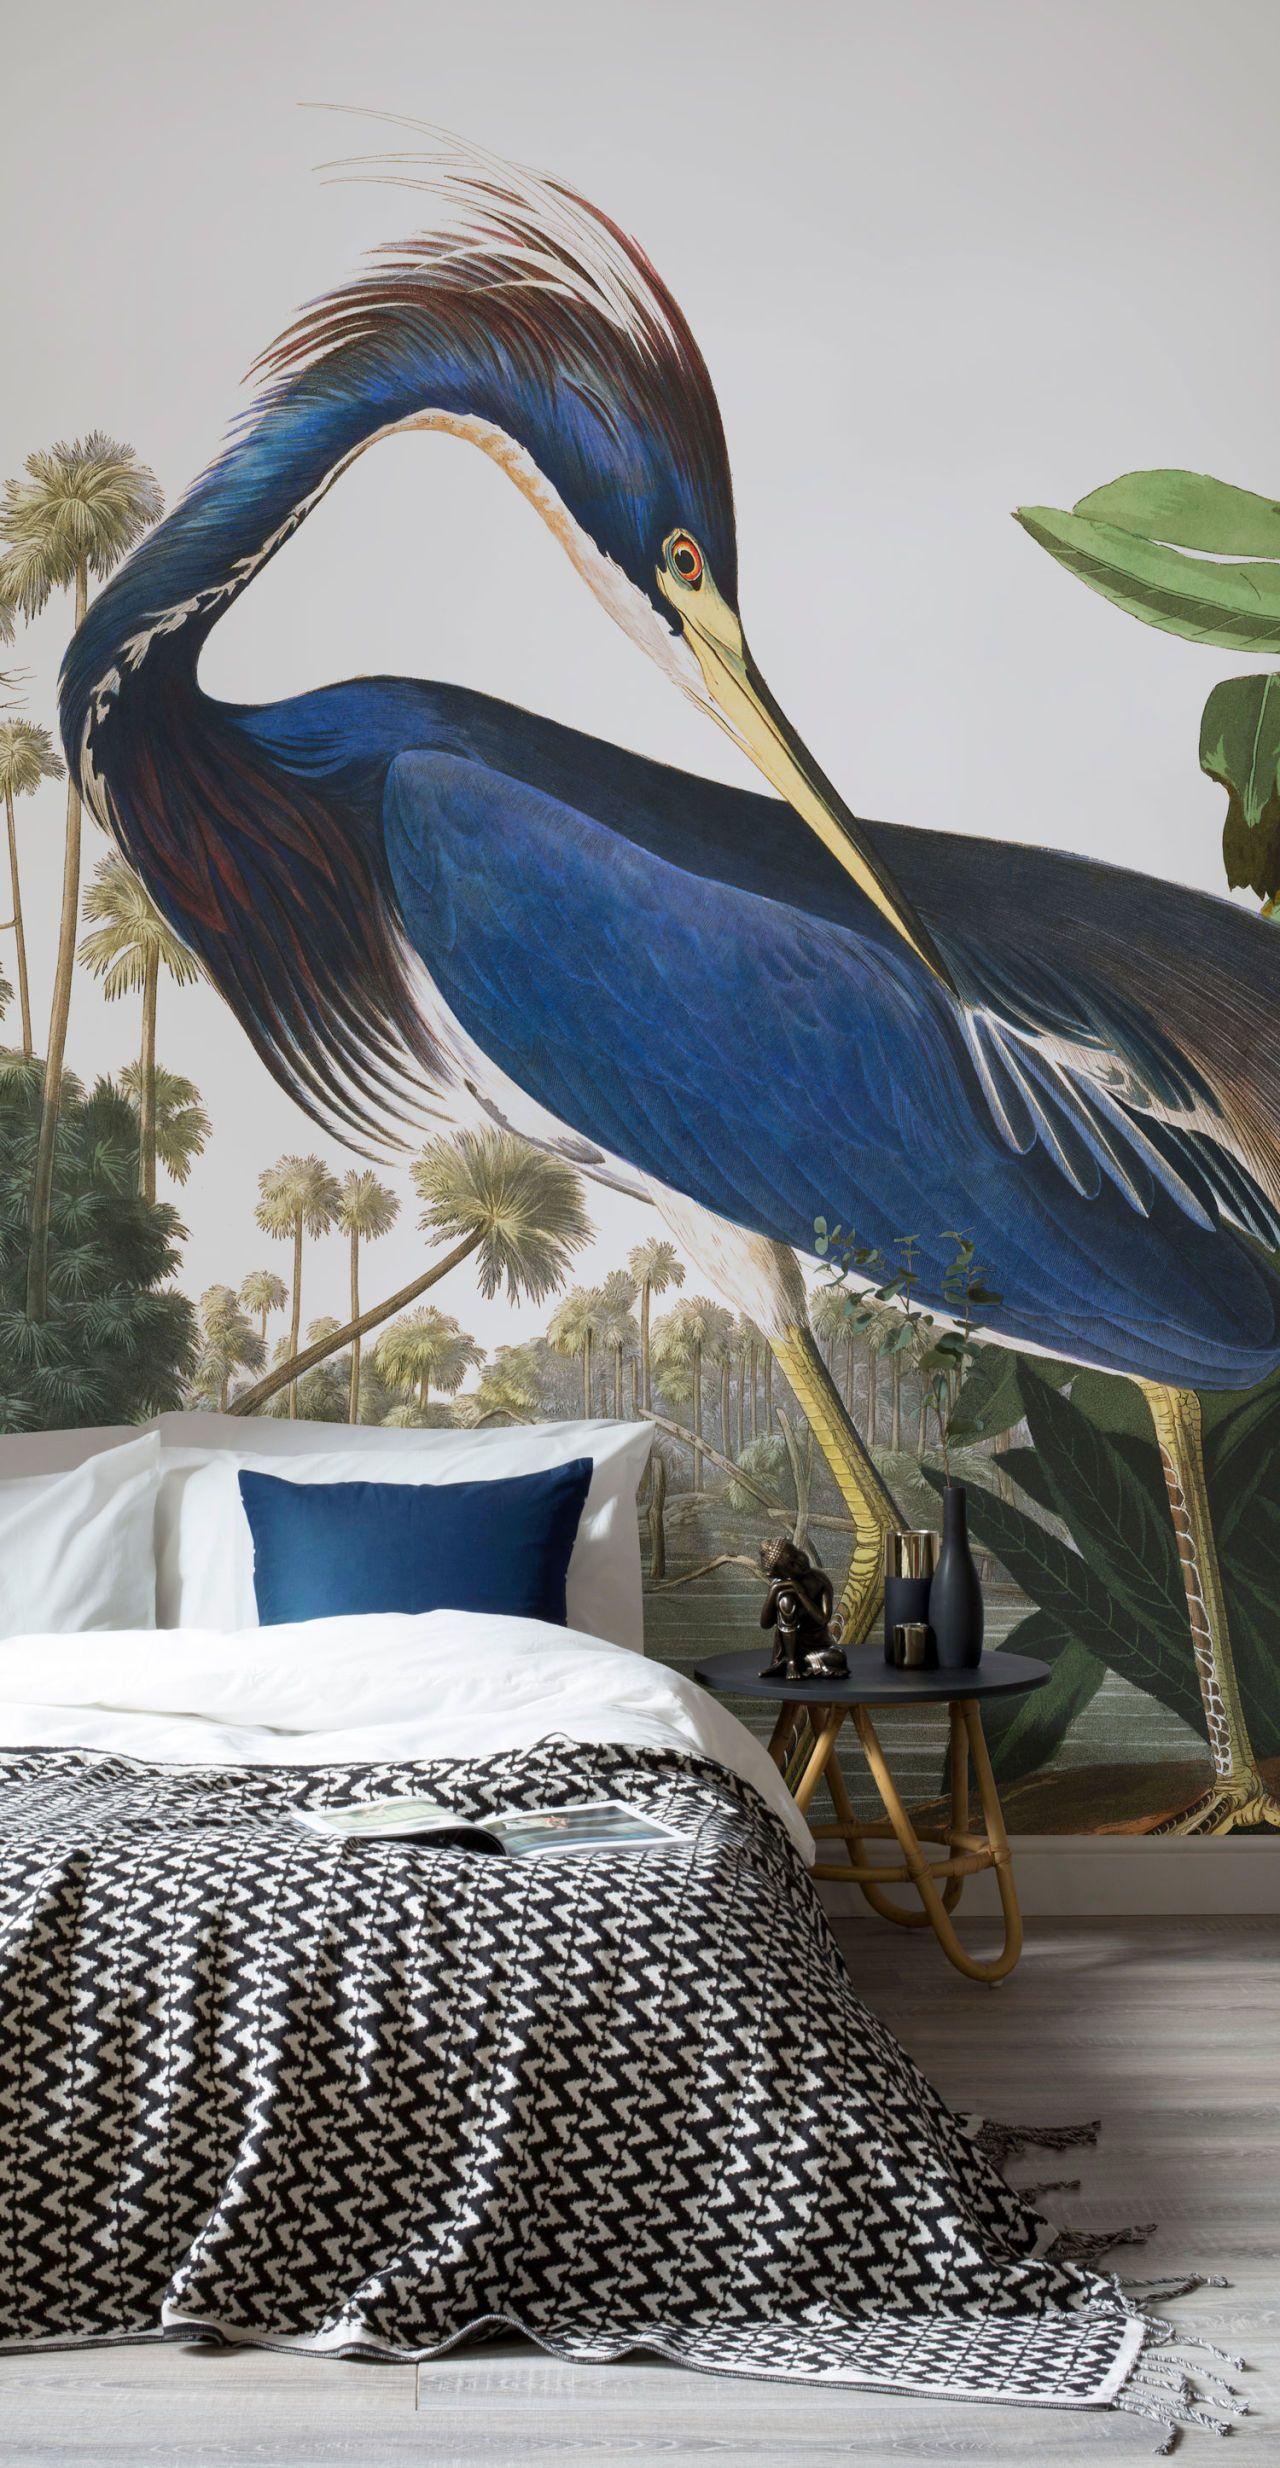 6 largerthanlife bird print wall murals from the world's